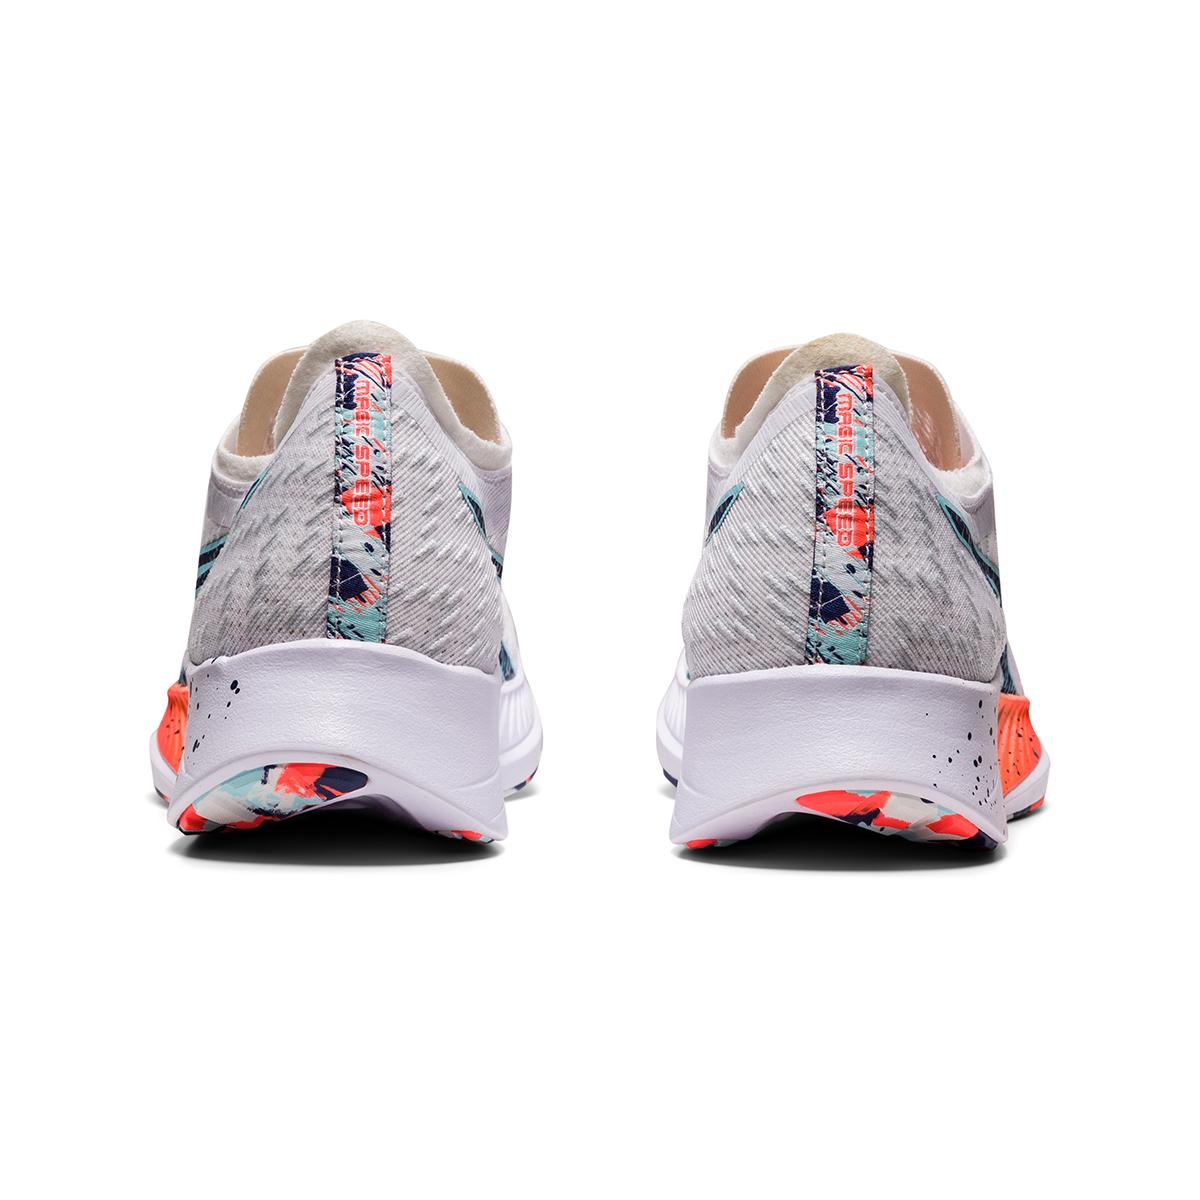 Women's Asics Magic Speed Running Shoe - Color: White/Thunder Blue - Size: 5 - Width: Regular, White/Thunder Blue, large, image 7